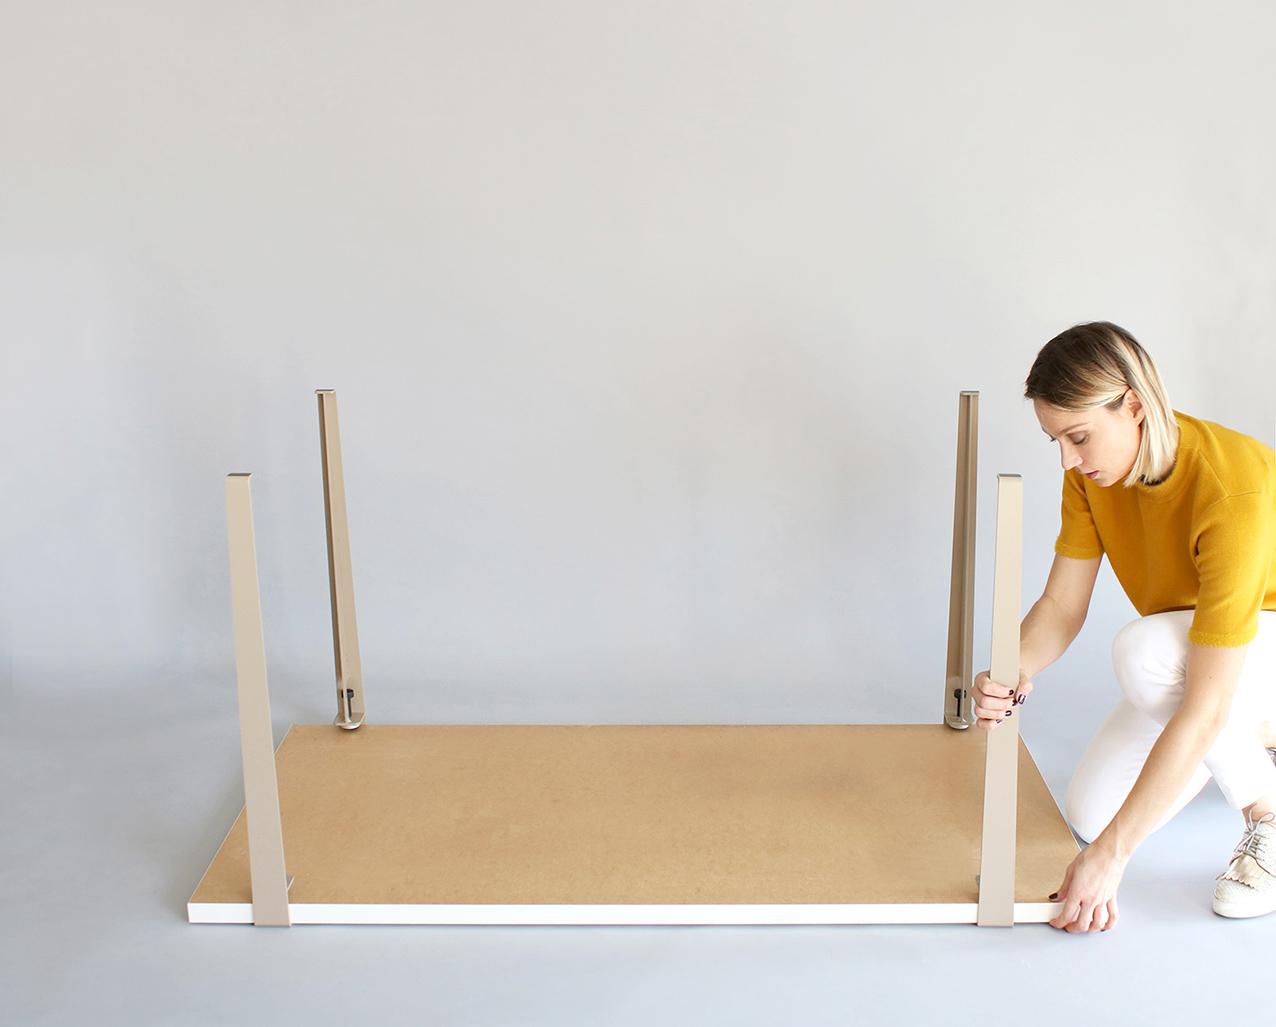 diy bureau design tiptoe blog diy mode lyon artlex. Black Bedroom Furniture Sets. Home Design Ideas